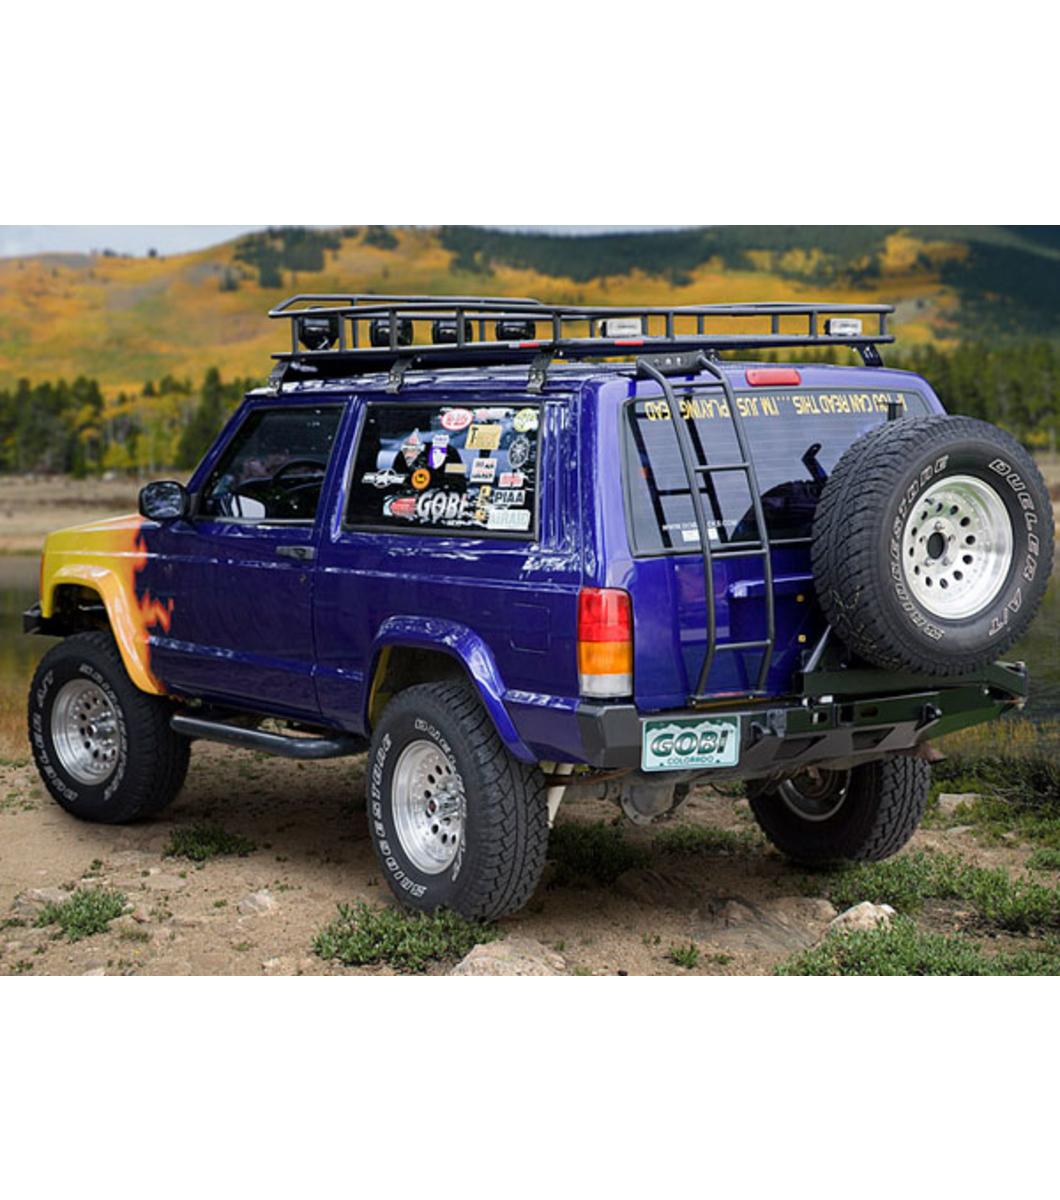 jeep cherokee xj ranger rack multi light setup no sunroof gobi racks. Black Bedroom Furniture Sets. Home Design Ideas